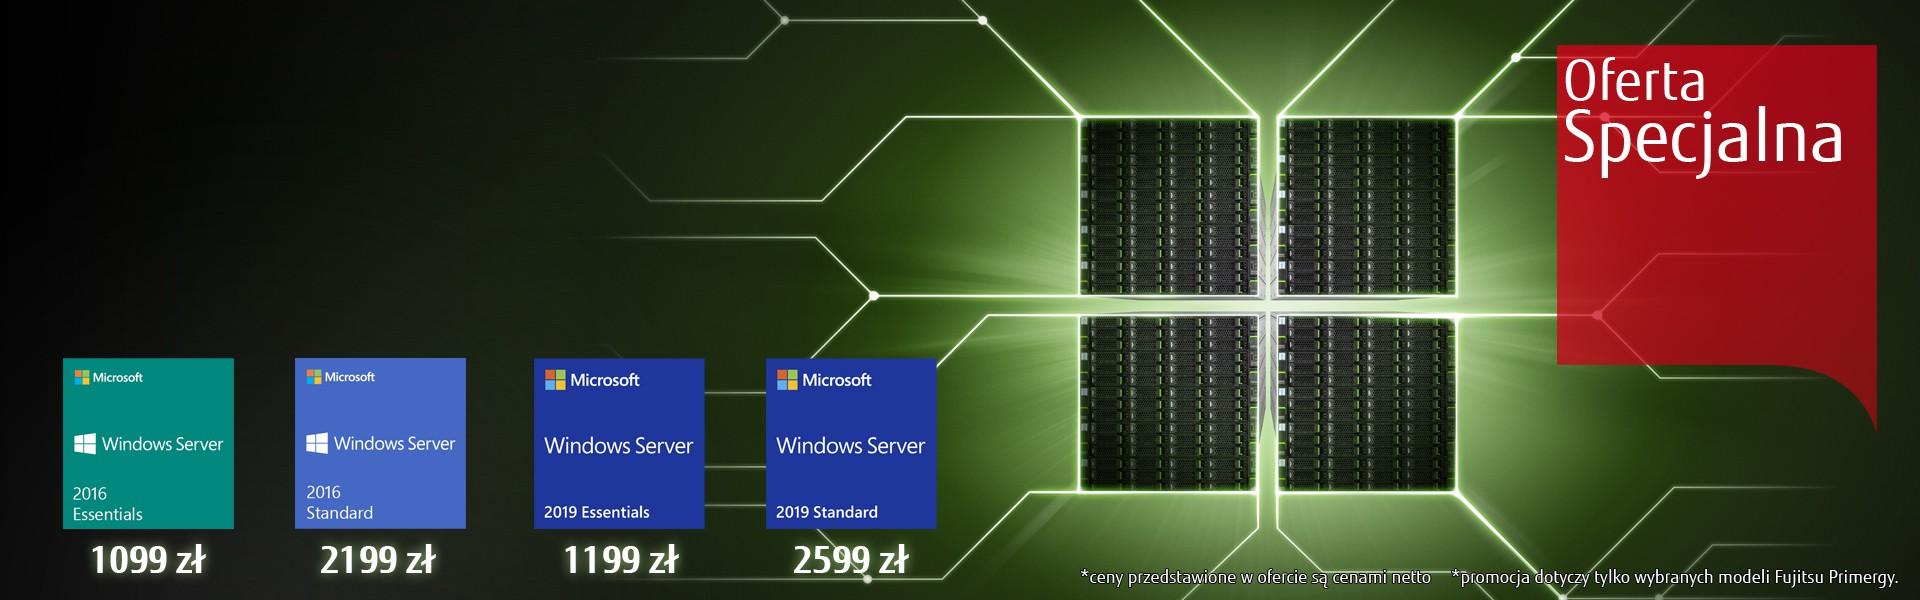 Windows Server 2016 & 2019